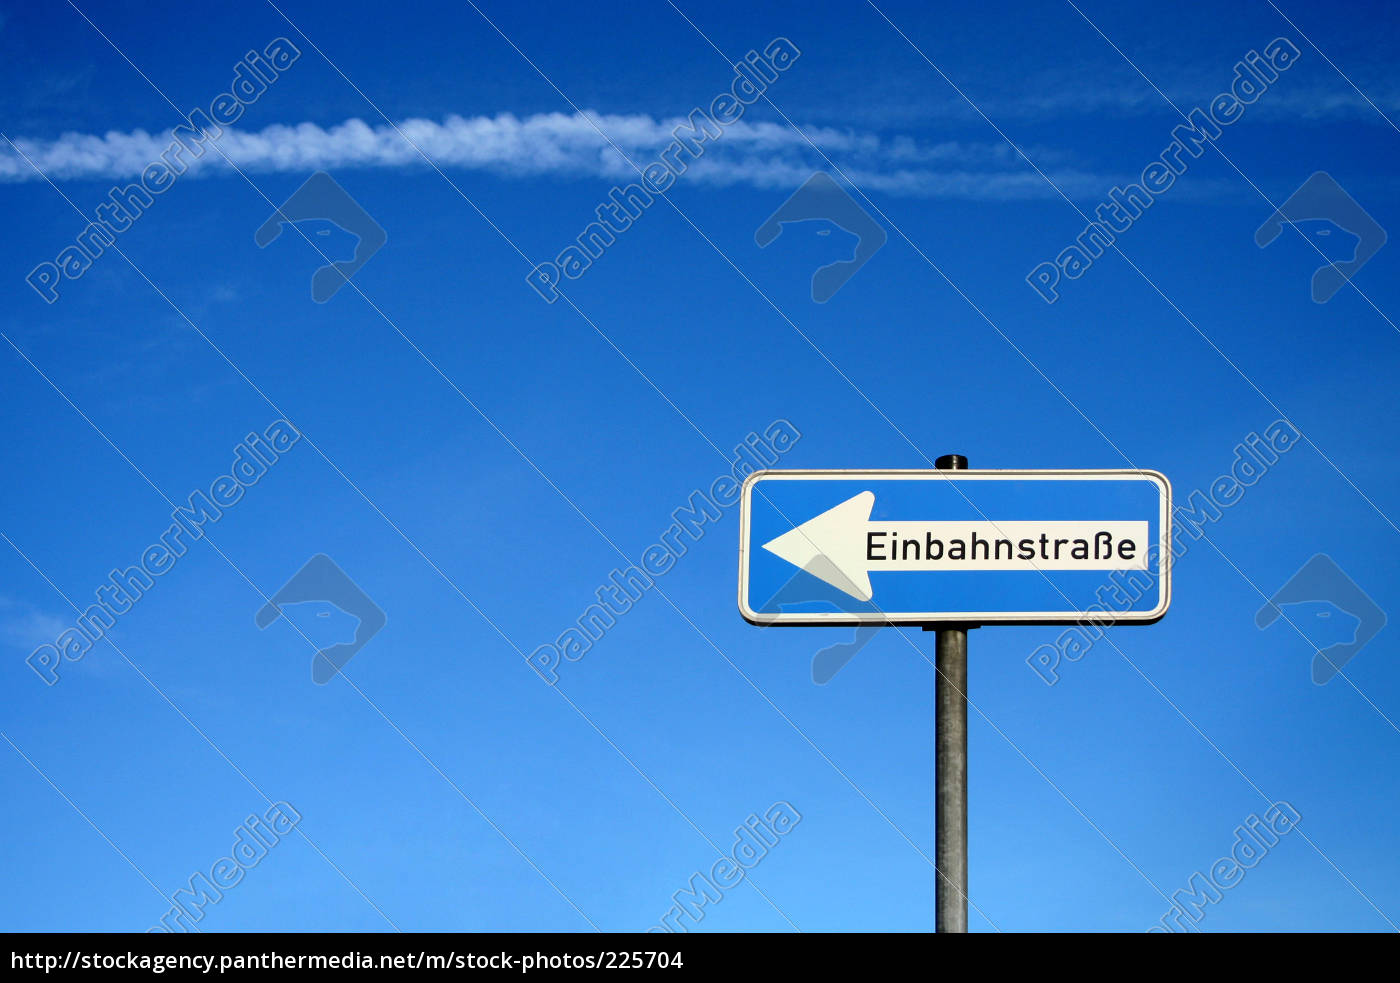 -, one-way, street, - - 225704